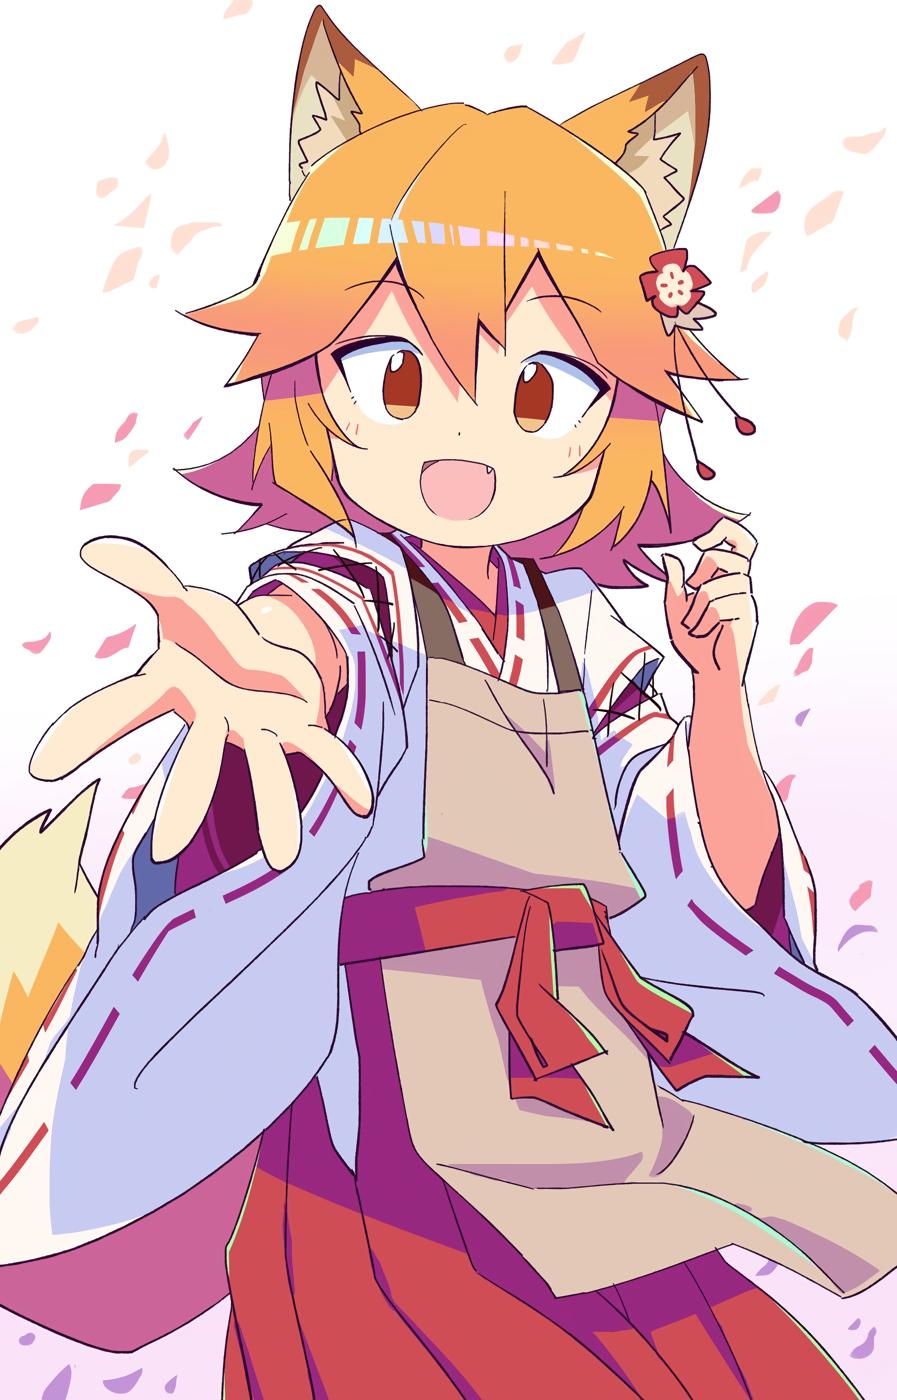 Senko [The Helpful Fox Senko-san]